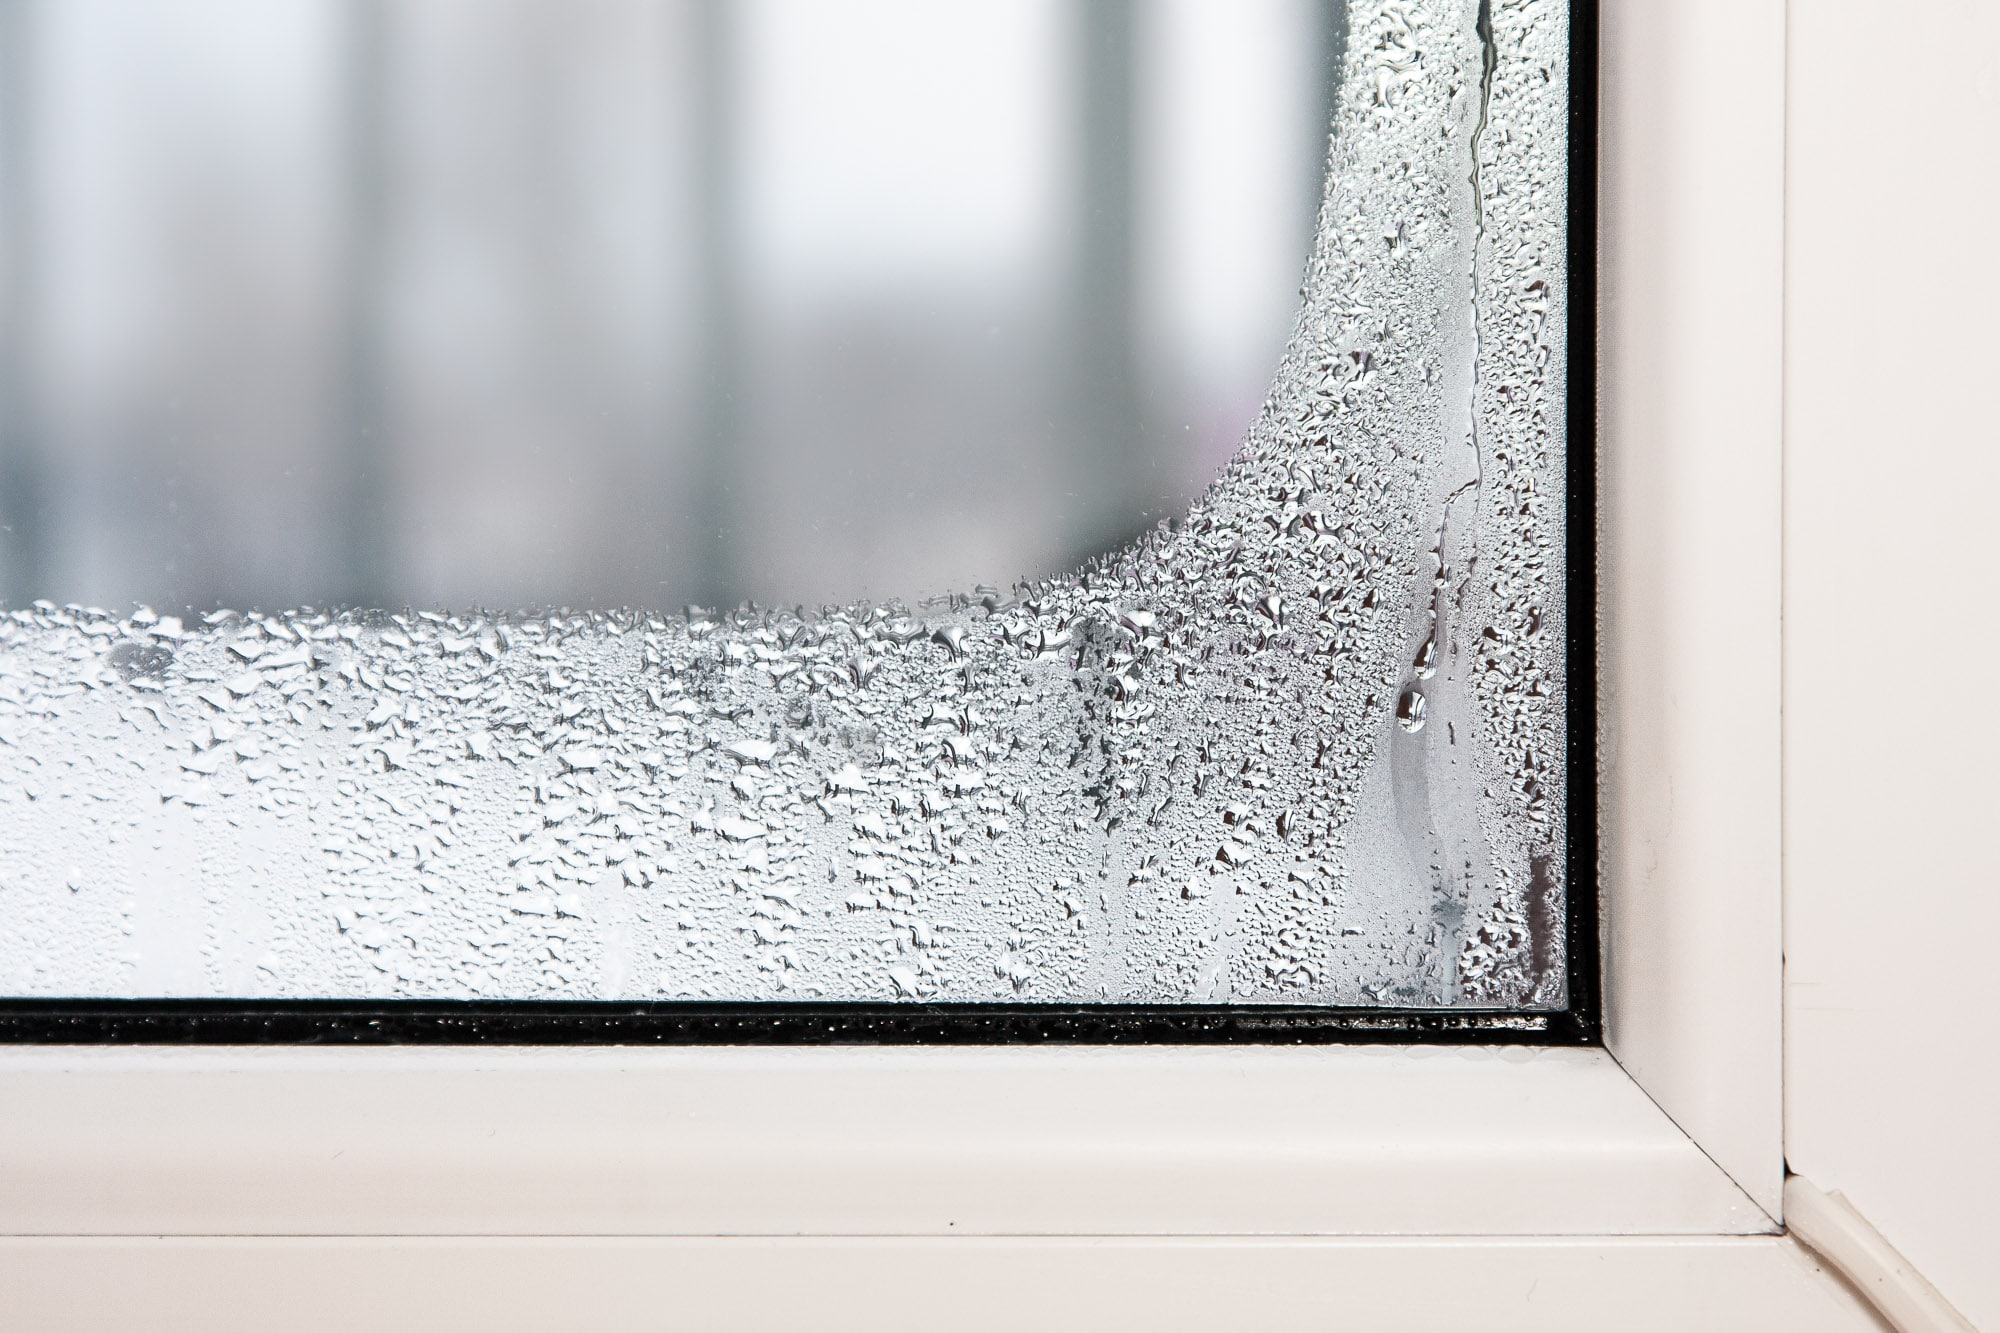 kondenswasser am fenster kondenswasser am fenster. Black Bedroom Furniture Sets. Home Design Ideas